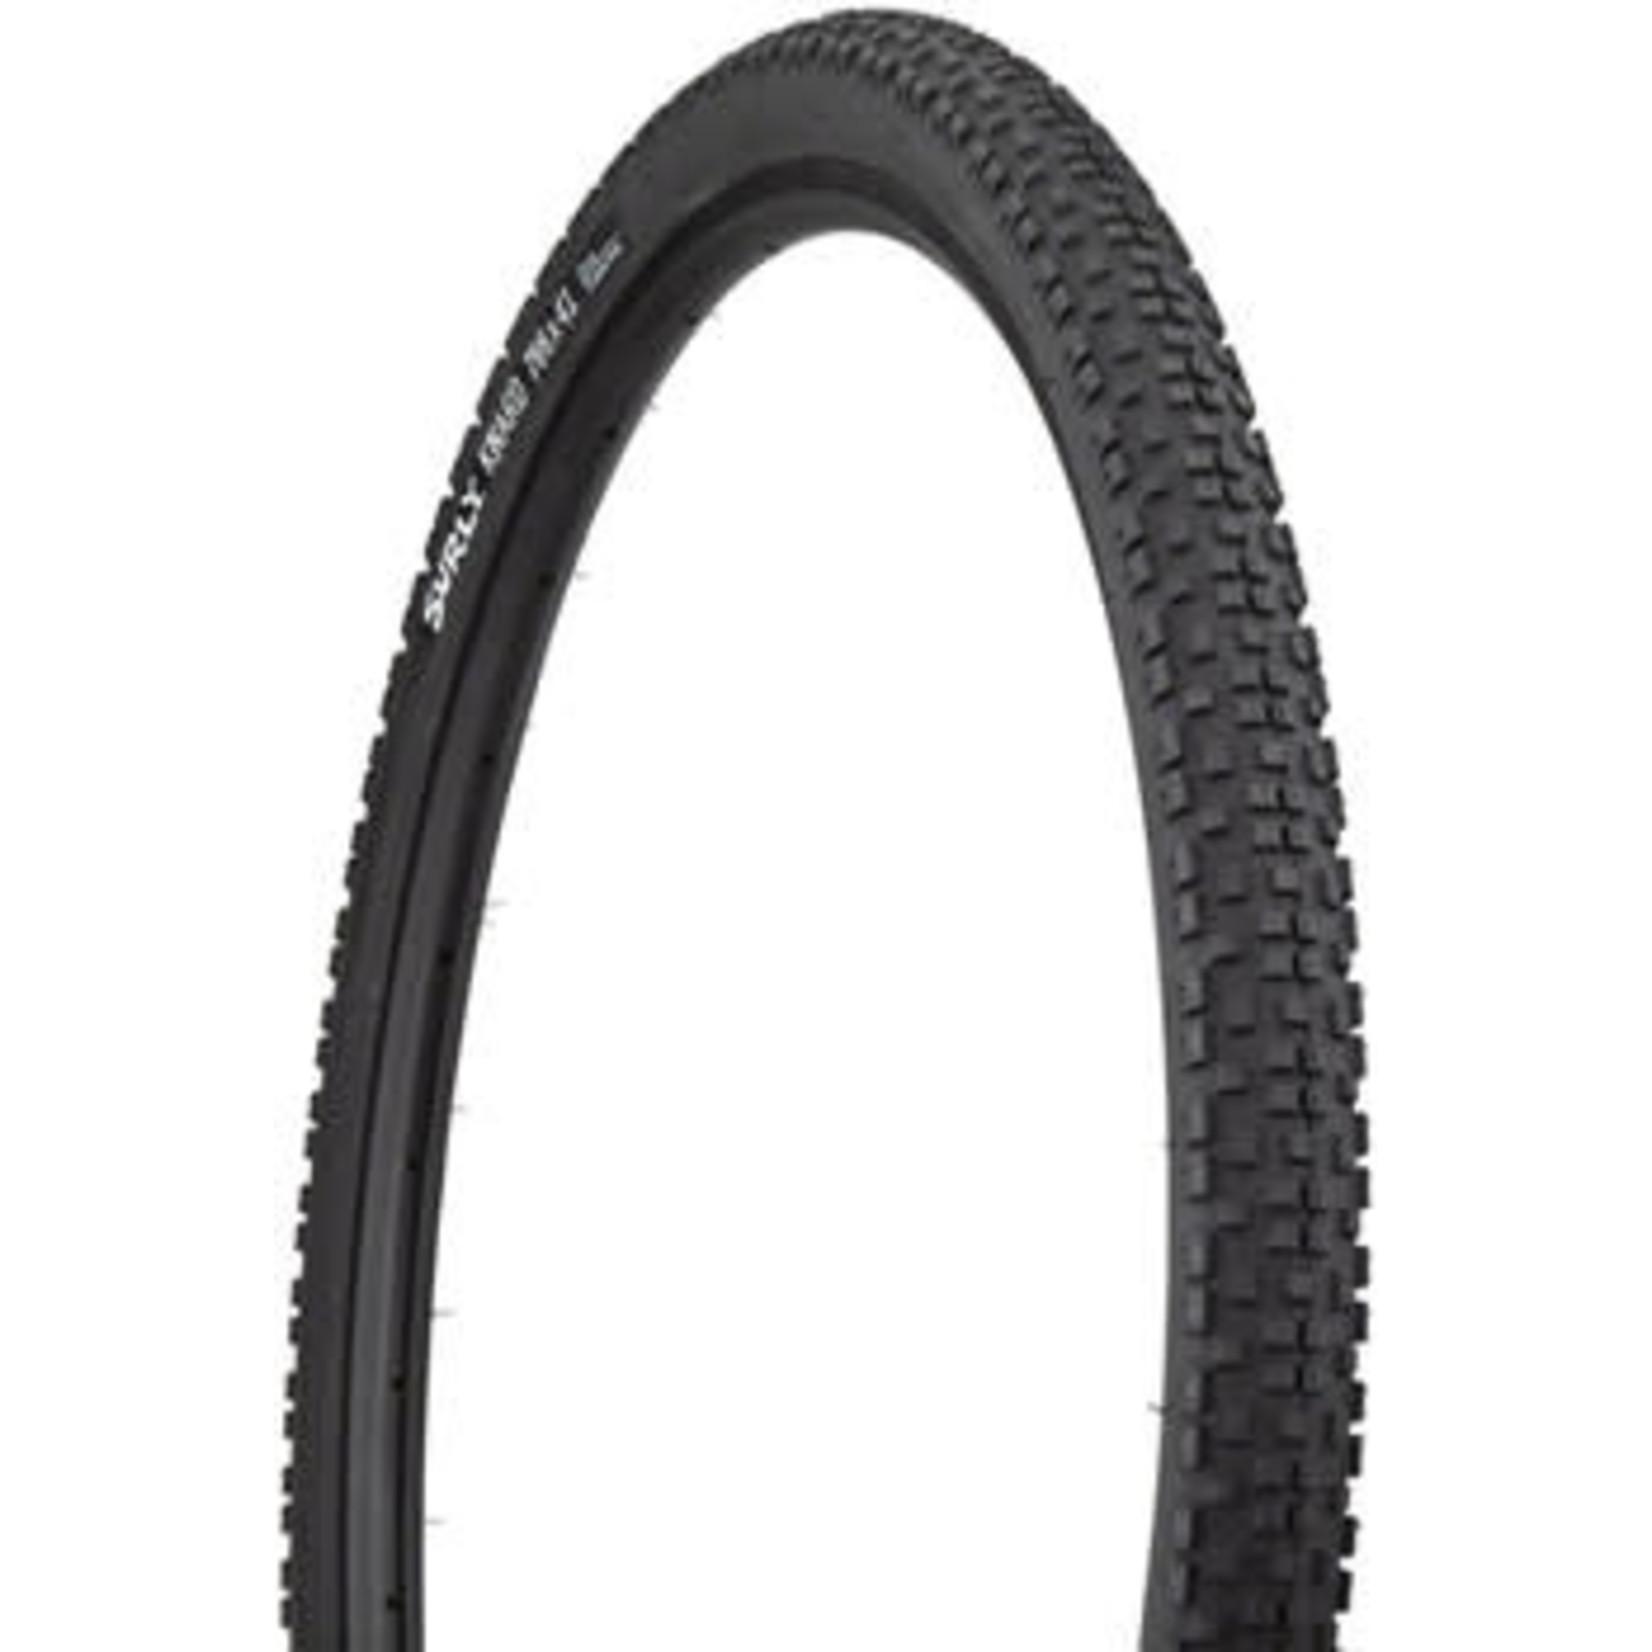 Surly Surly Knard Tire - 700 x 41, Tubeless, Folding, Black, 60tpi